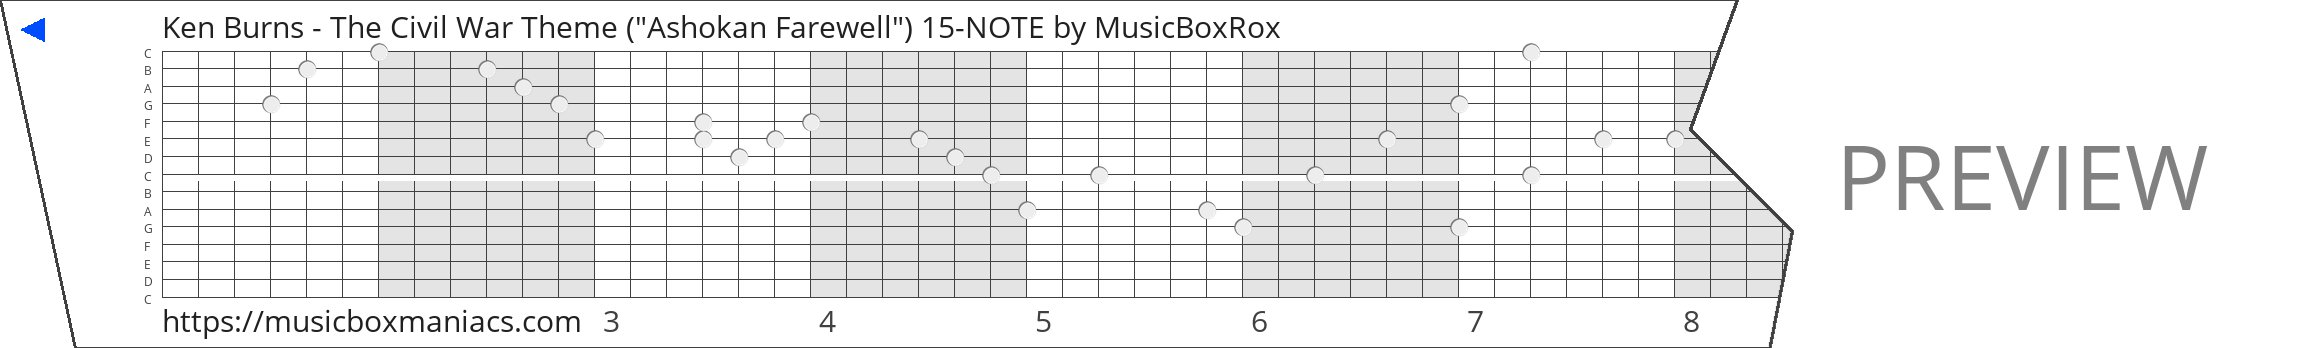 "Ken Burns - The Civil War Theme (""Ashokan Farewell"") 15-NOTE 15 note music box paper strip"